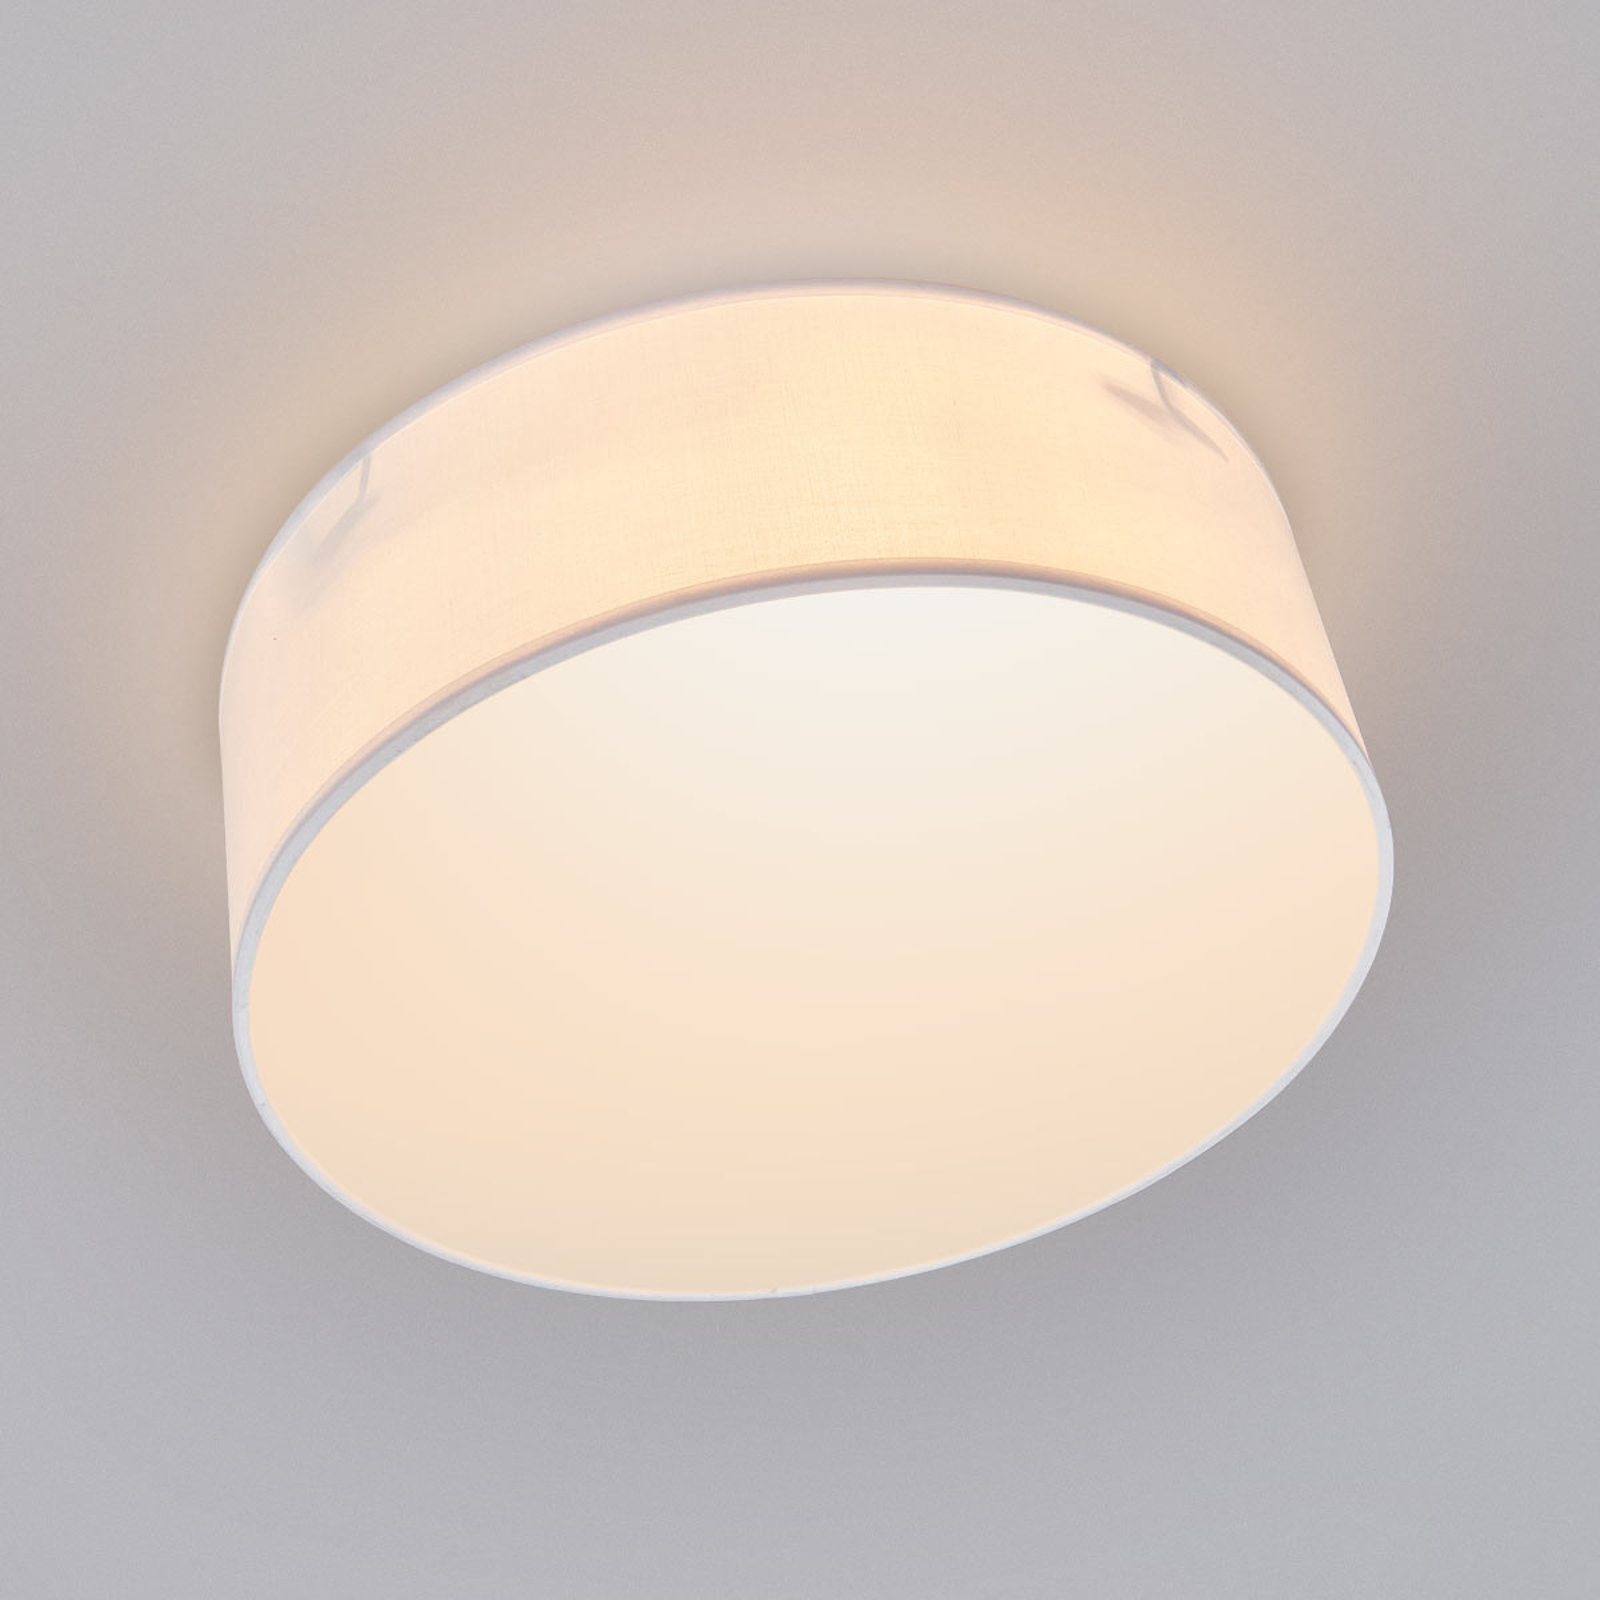 Biała lampa sufitowa CEILING DREAM, 30 cm